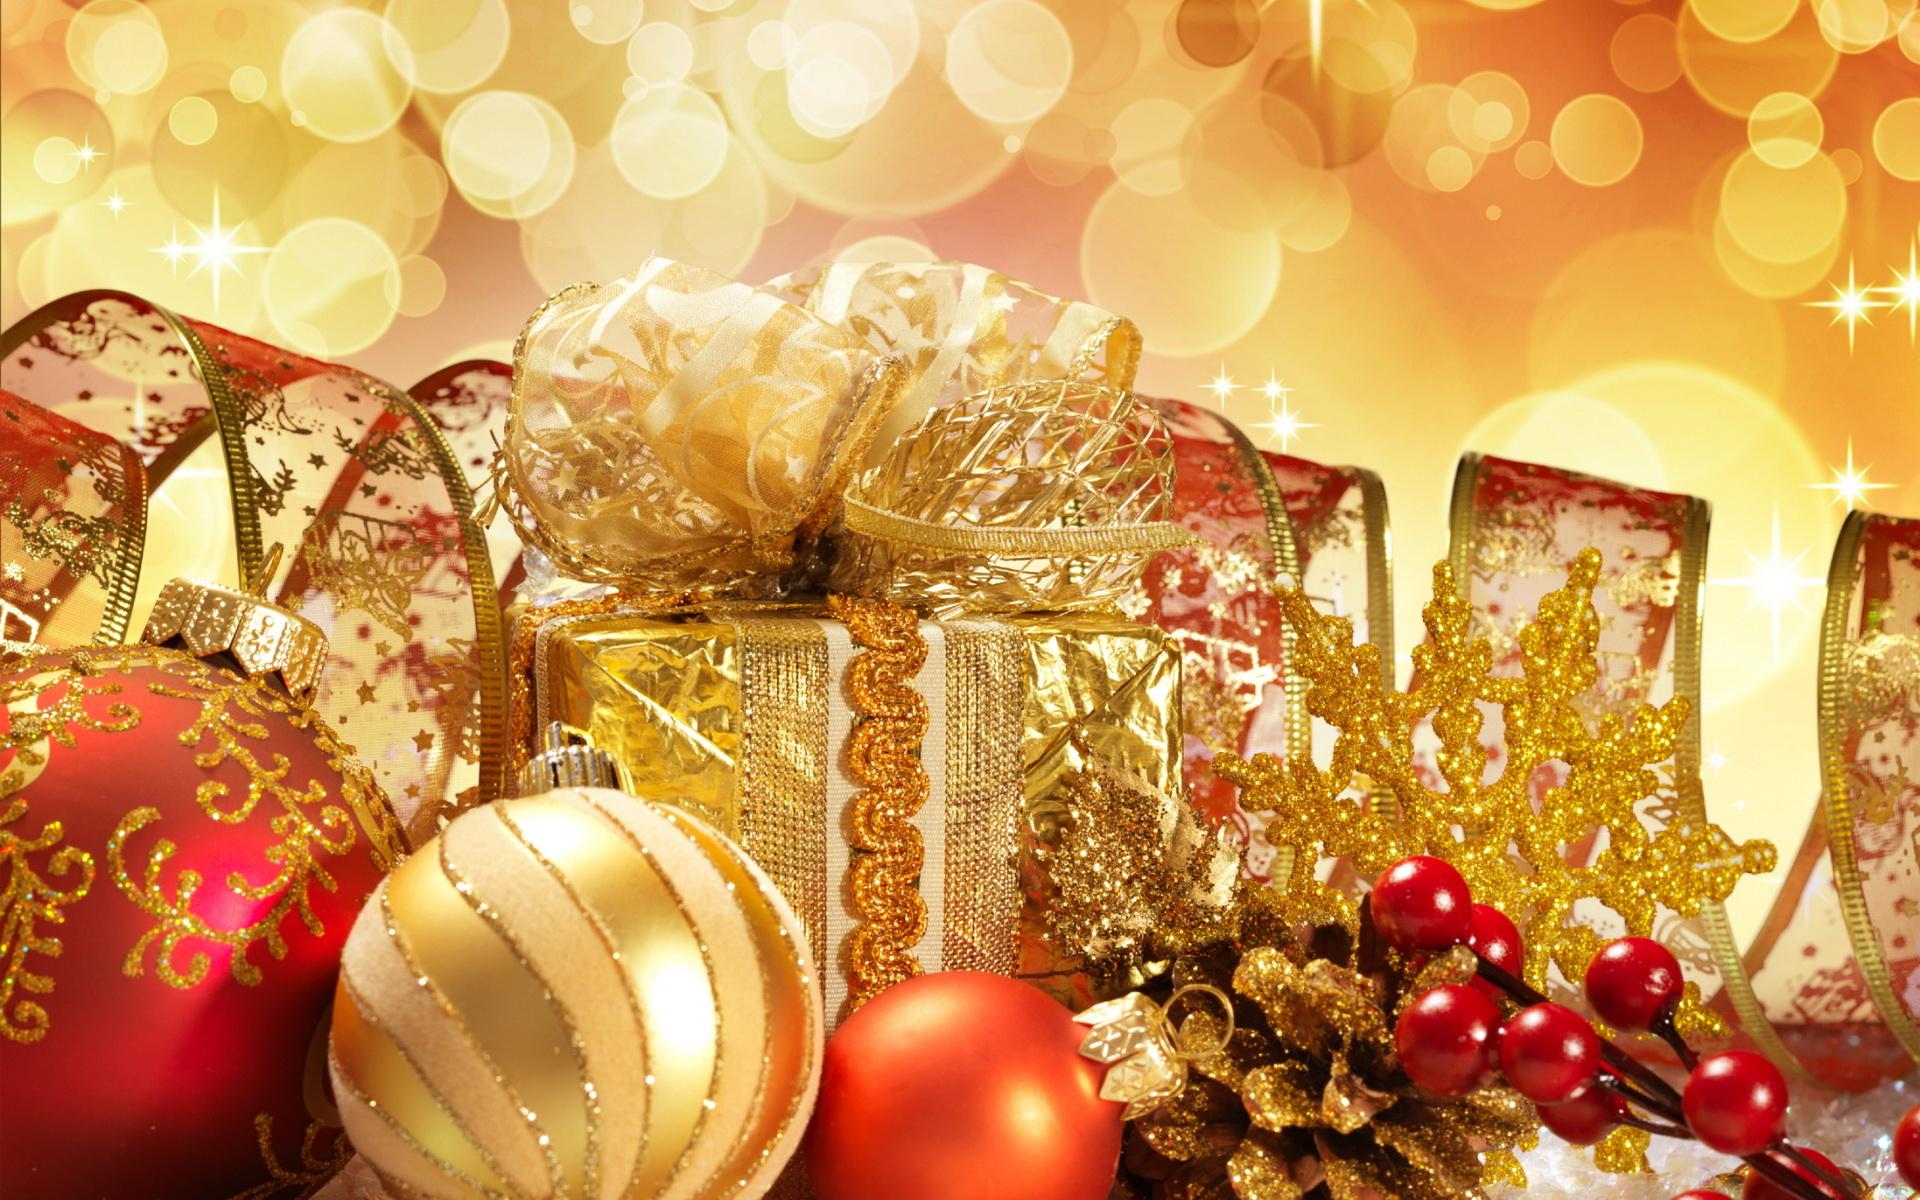 76] Christmas Decoration Wallpaper on WallpaperSafari 1920x1200